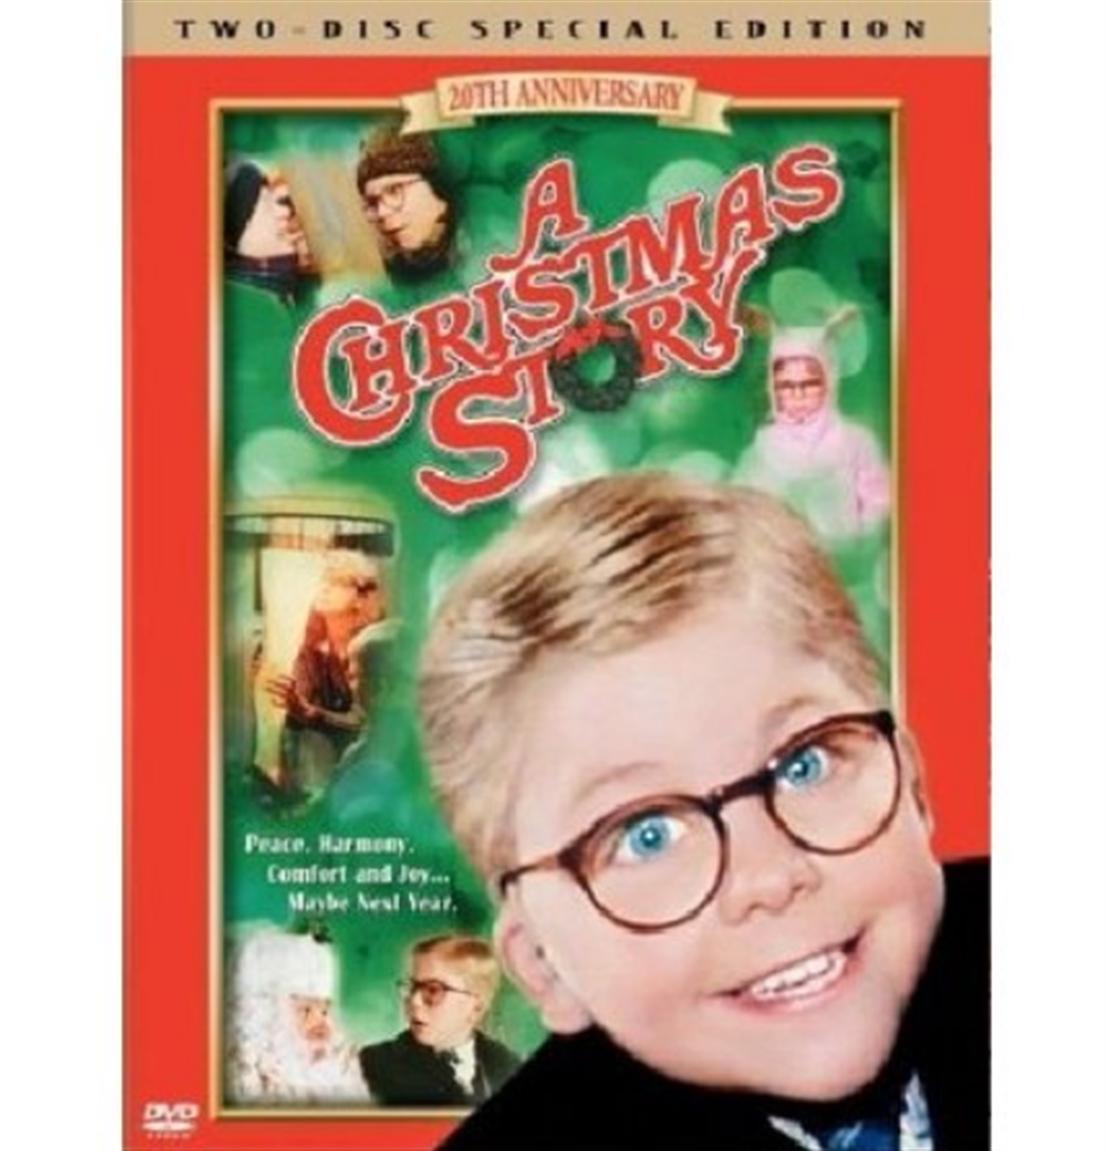 Walmart – A Christmas Story (DVD) Only $5.38, Reg $14.96 + Free Store Pickup!